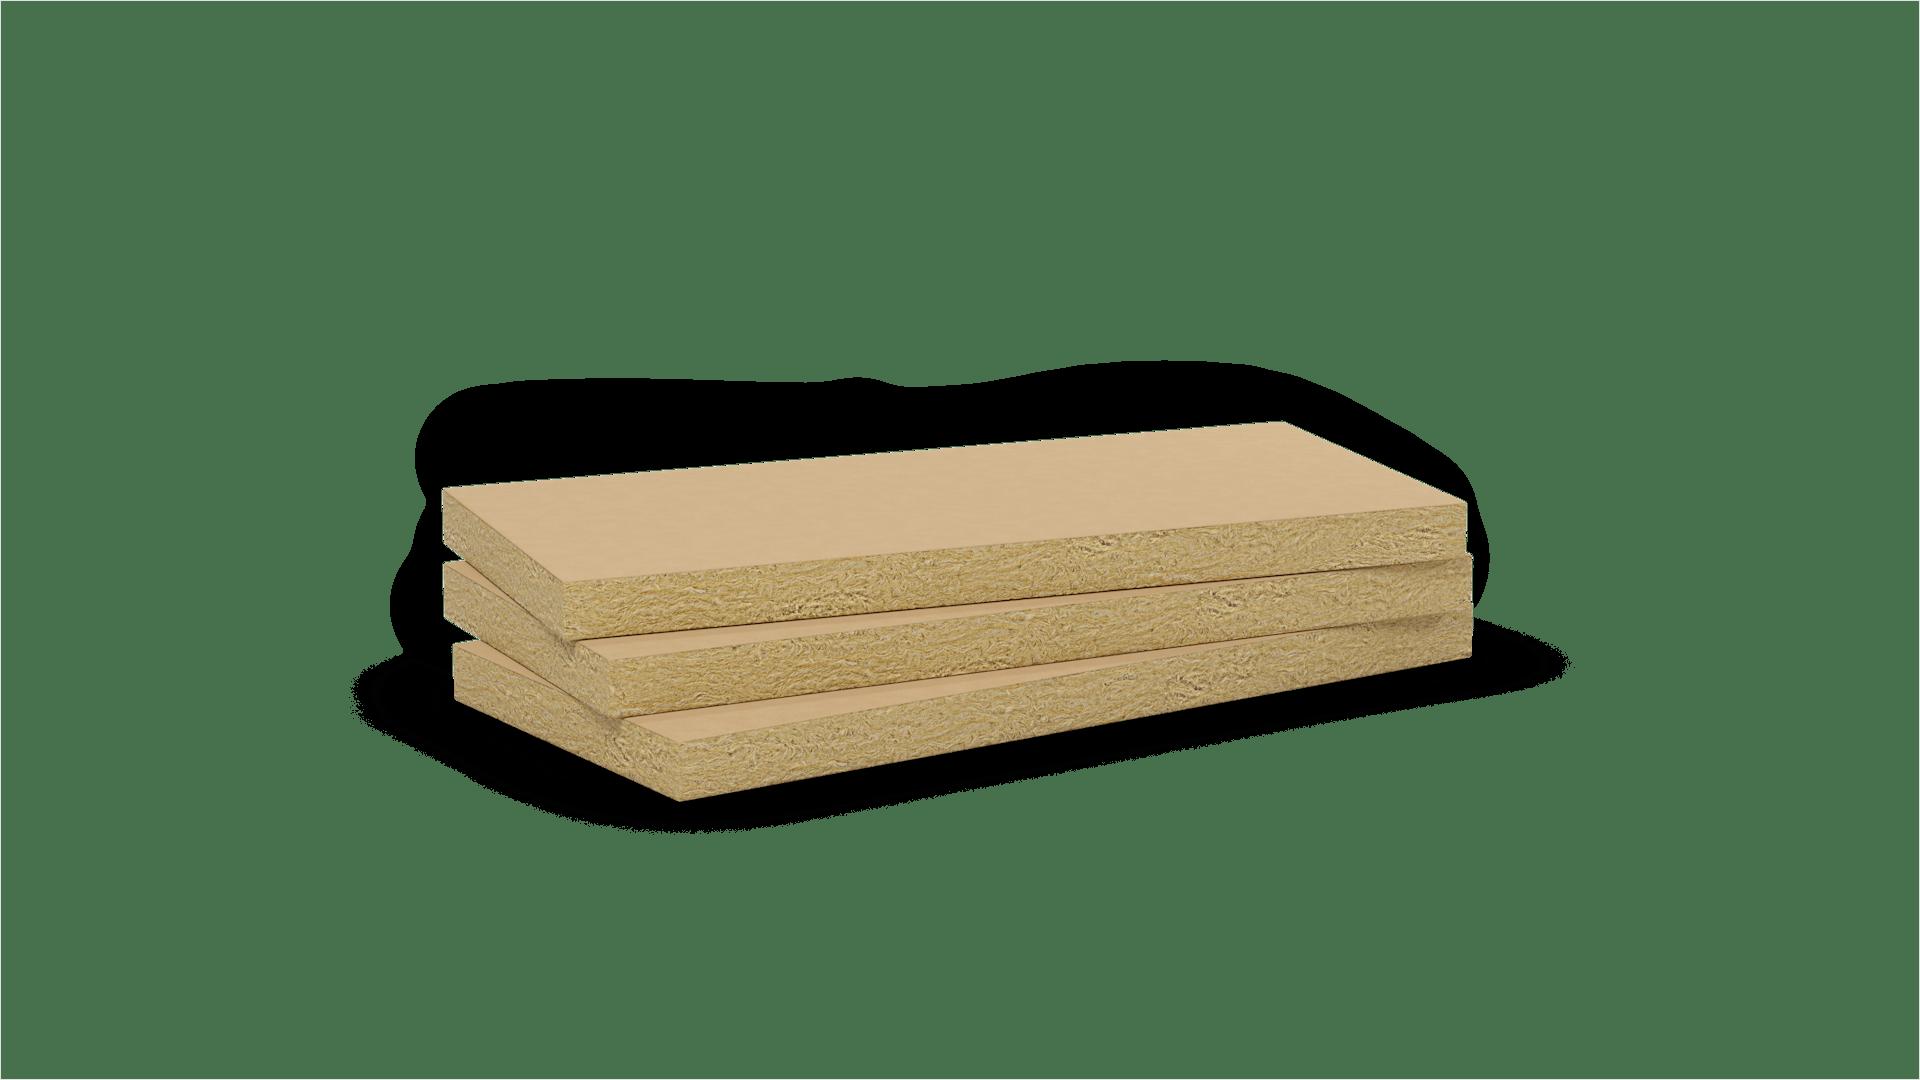 Mono density, mid-high density stone wool slab with kraft paper. Products: Confortpan 208.116, Rockmur Kraft, Rockplus Kraft, Airrock HD K1, Airrock 33 Kraft, Airrock 35 Kraft